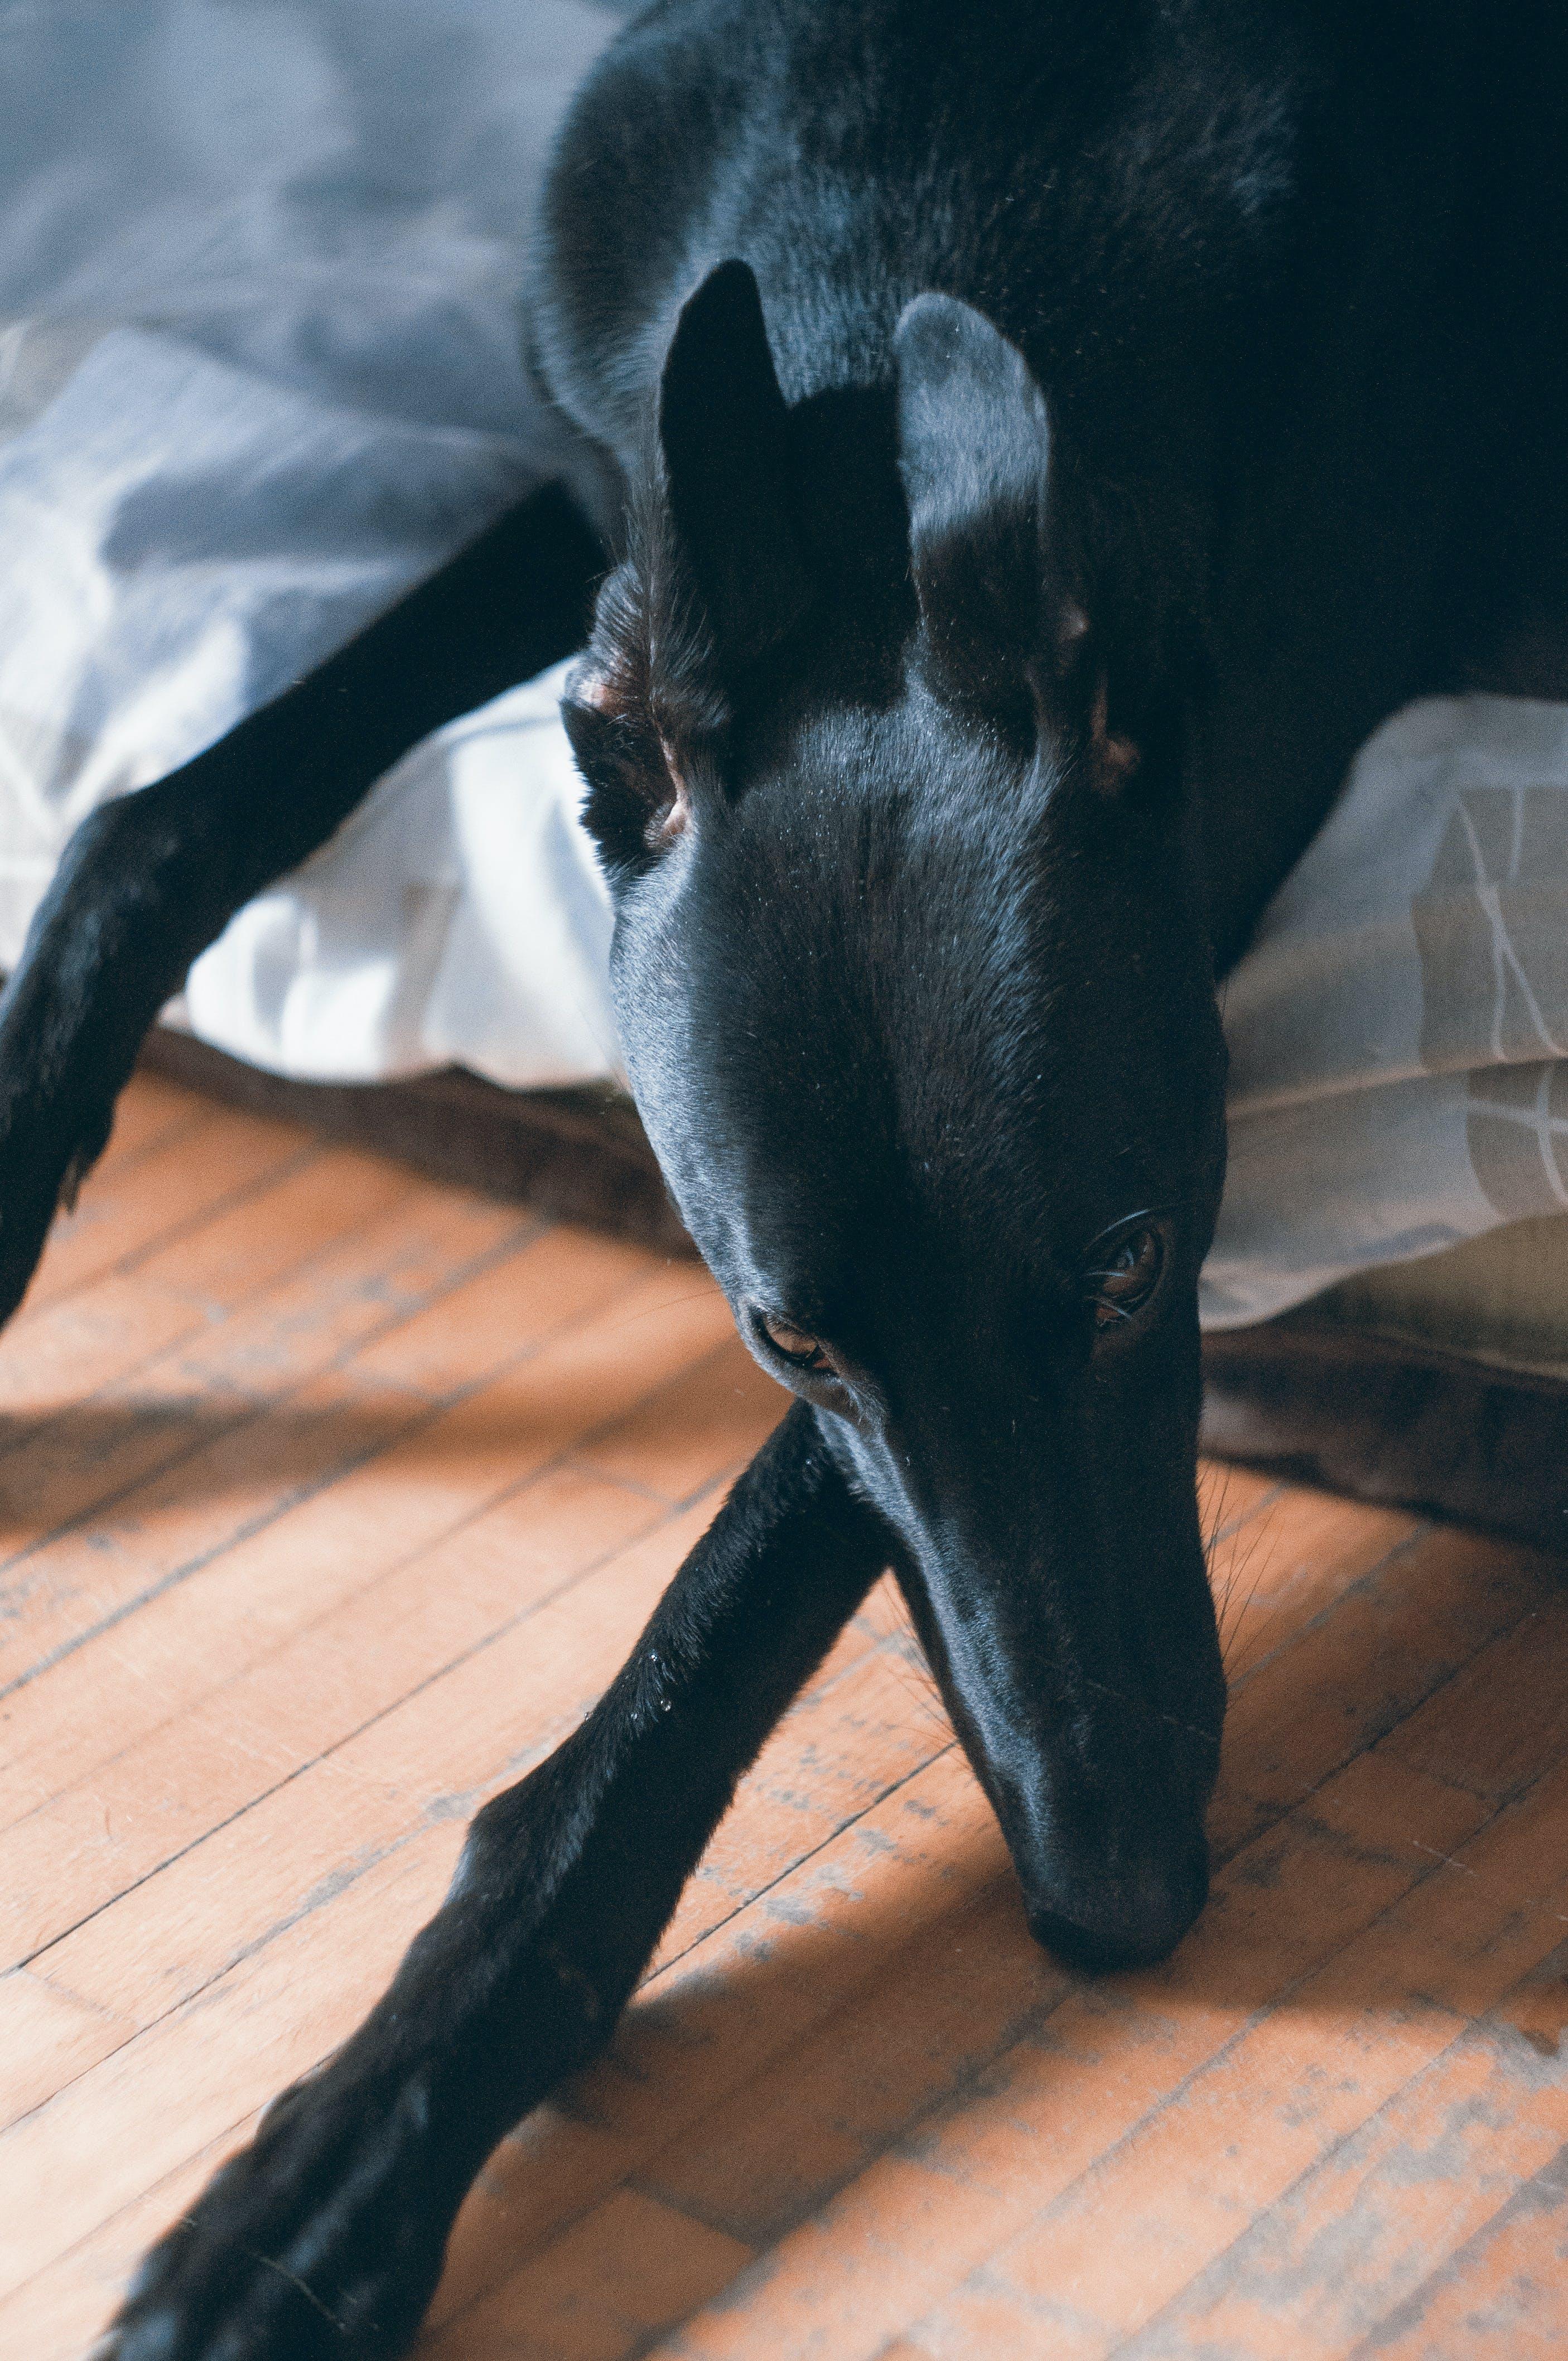 Free stock photo of adopted, animal portrait, black dog, Dog Resting